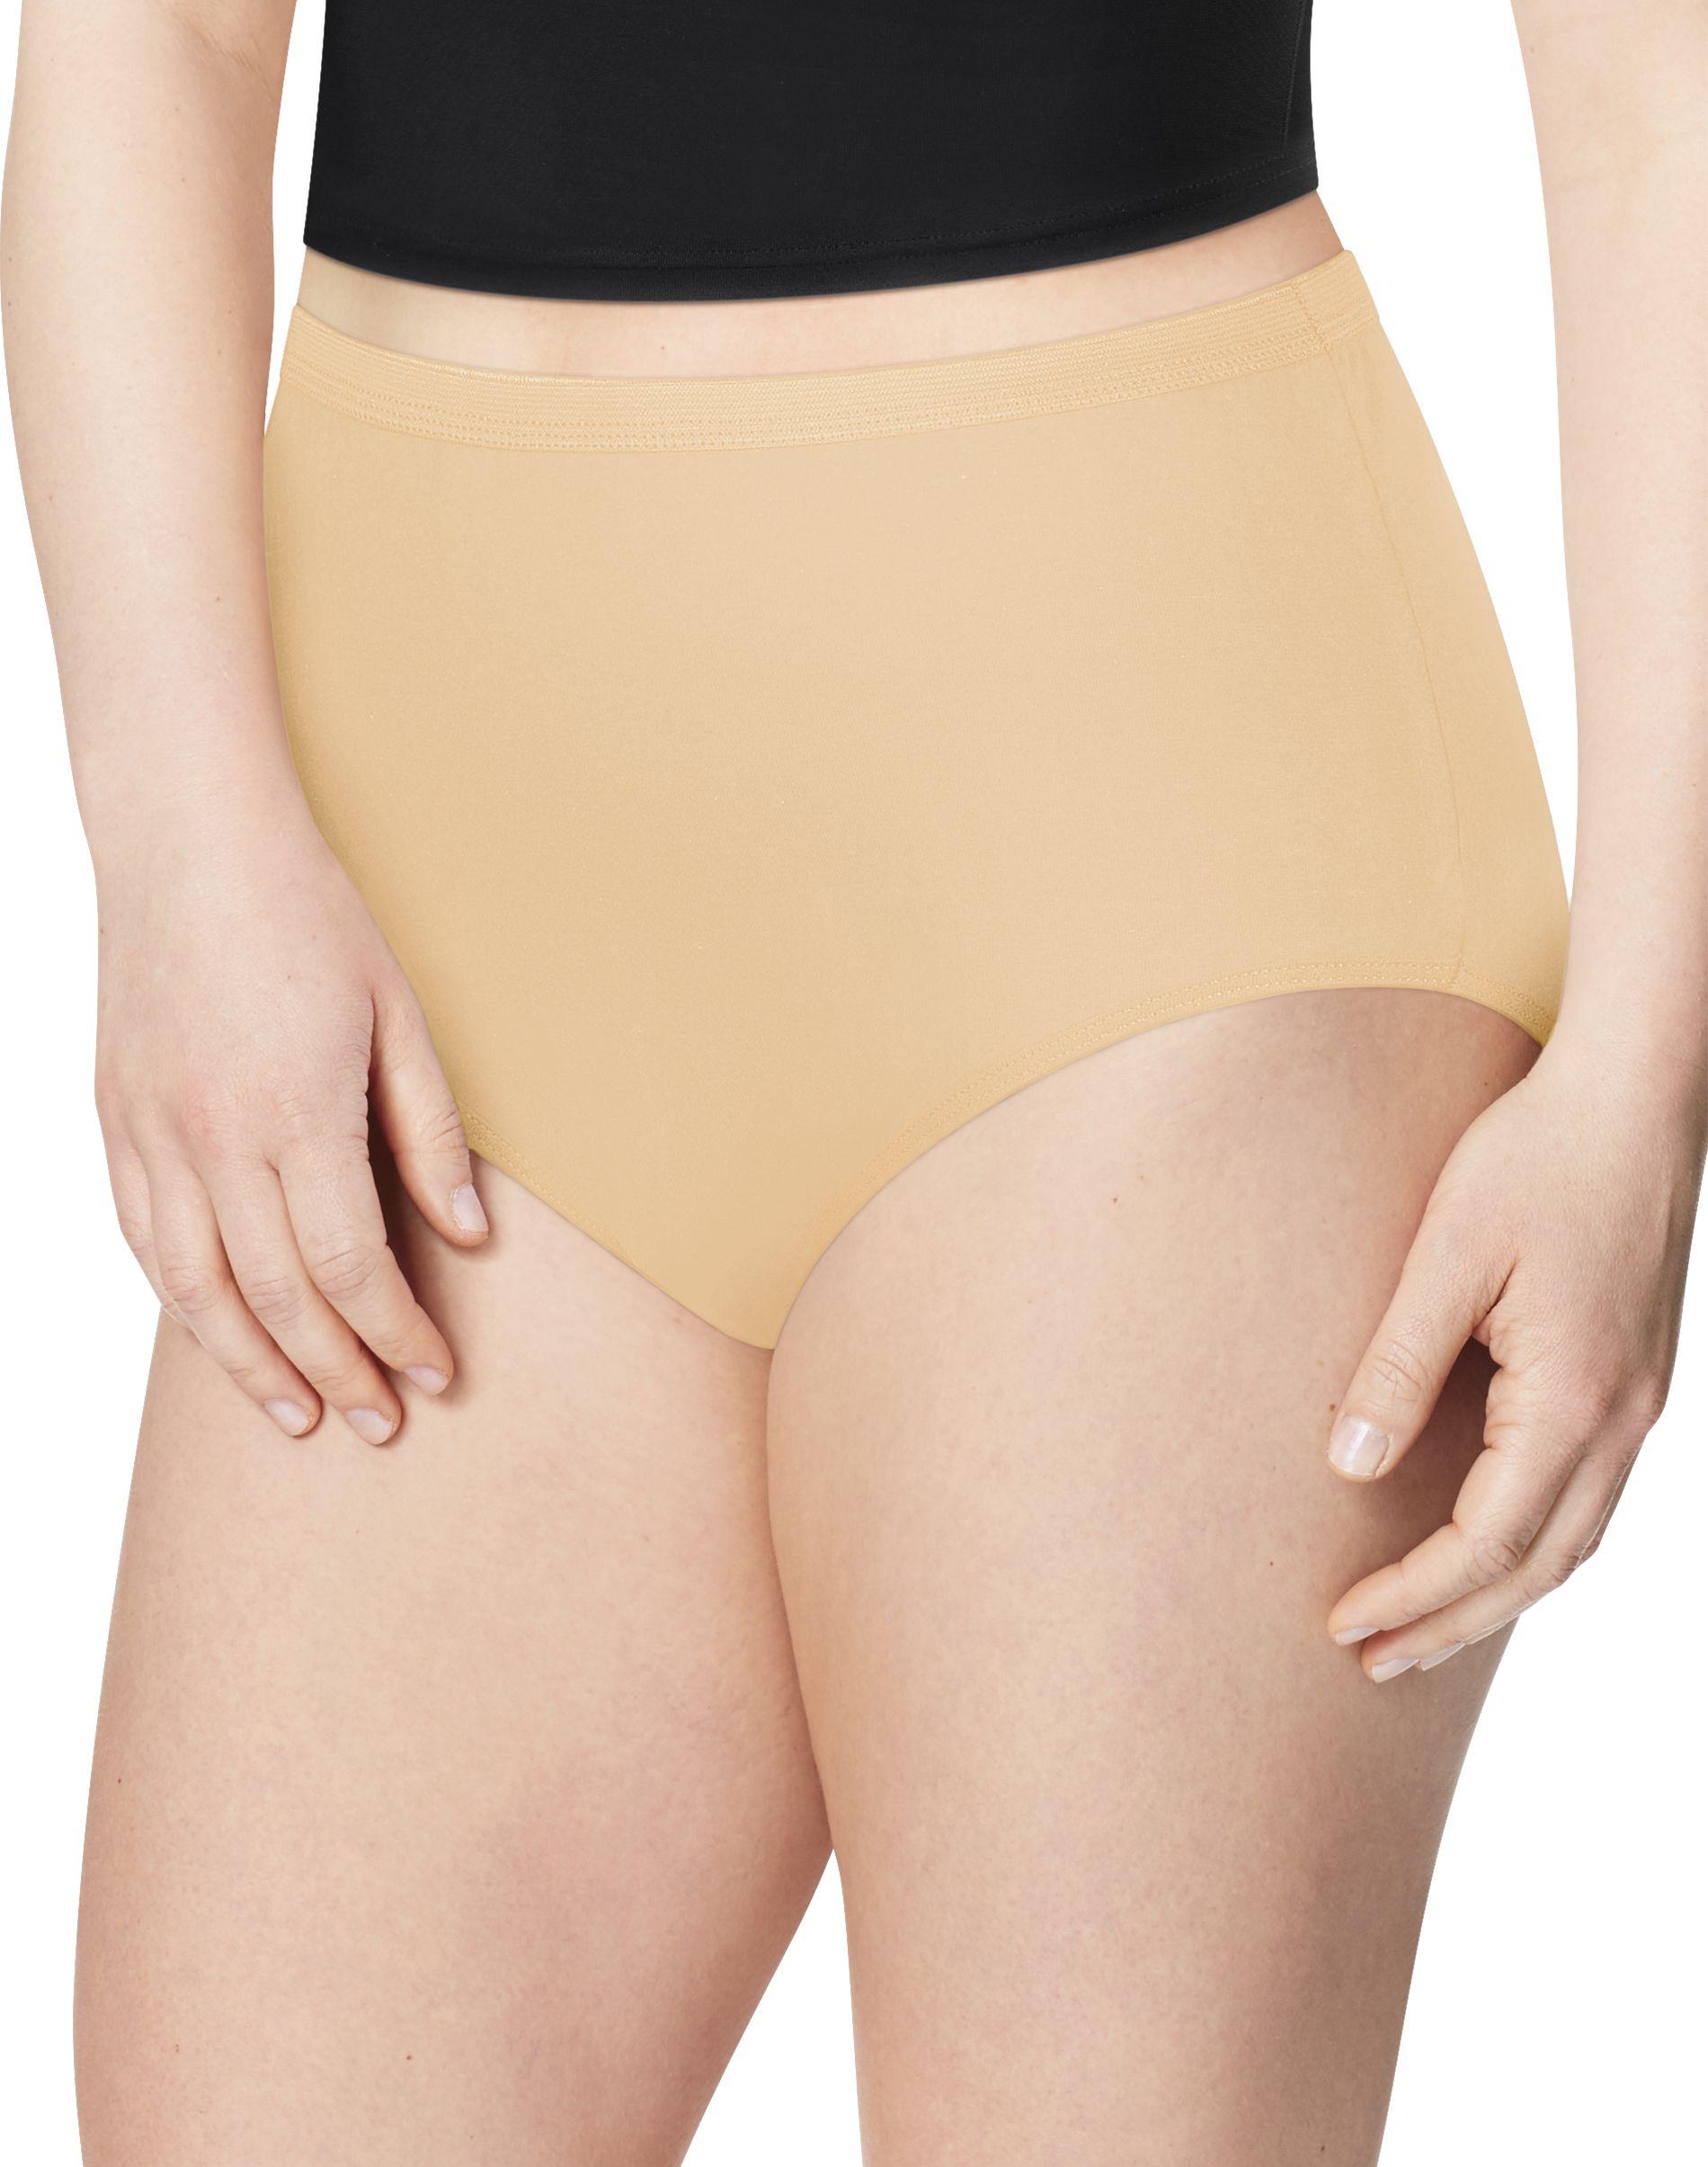 jms cotton body tone briefs, 6-pack women Just My Size